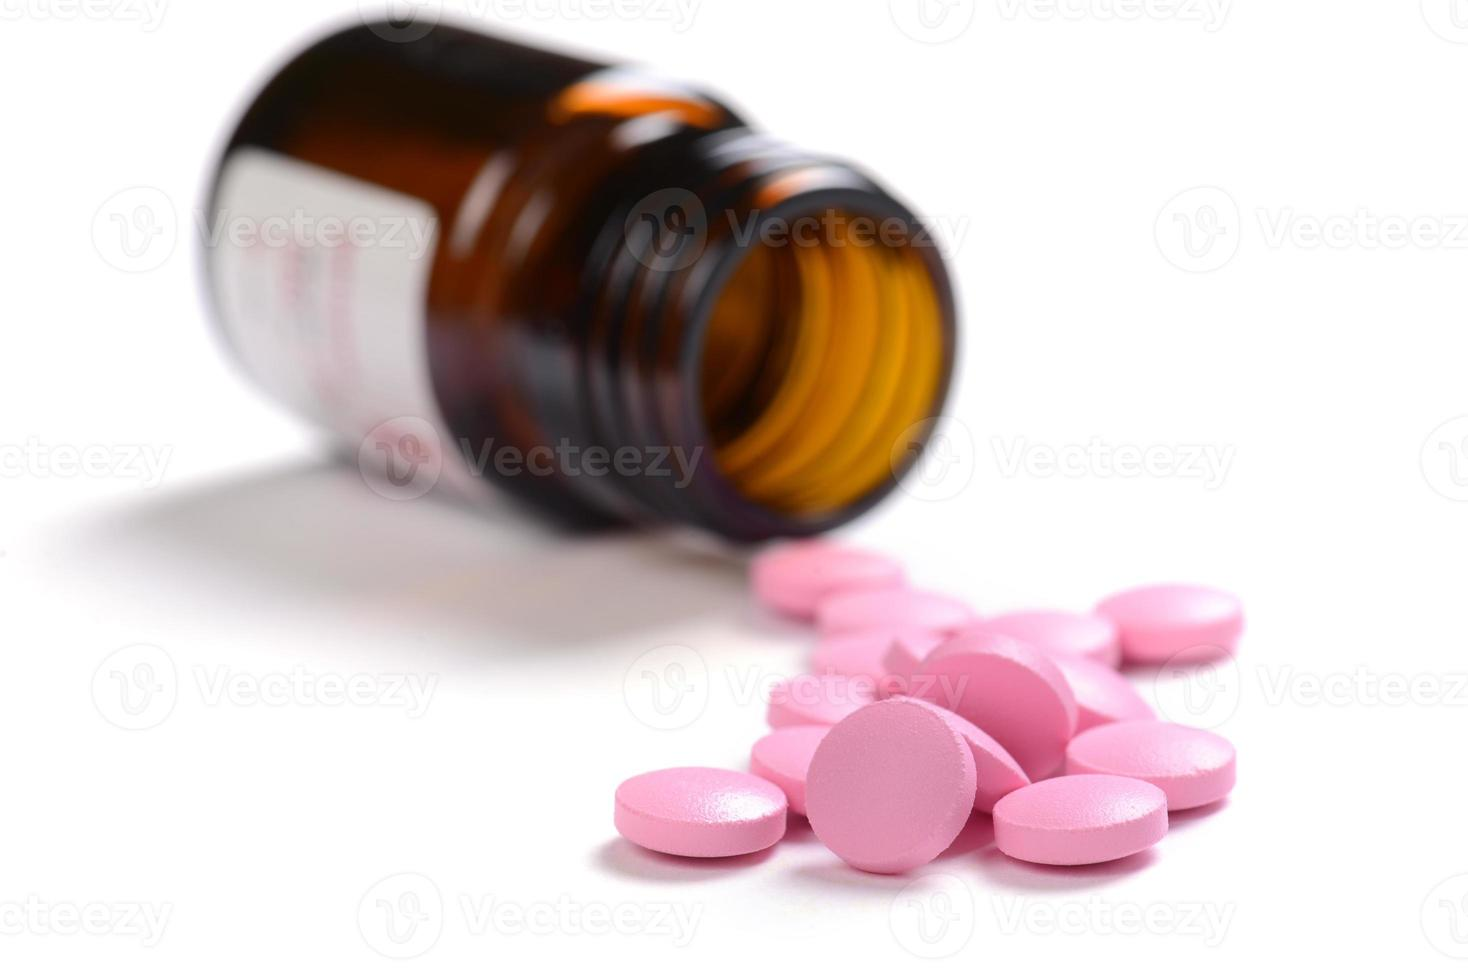 pastillas aisladas sobre fondo blanco foto